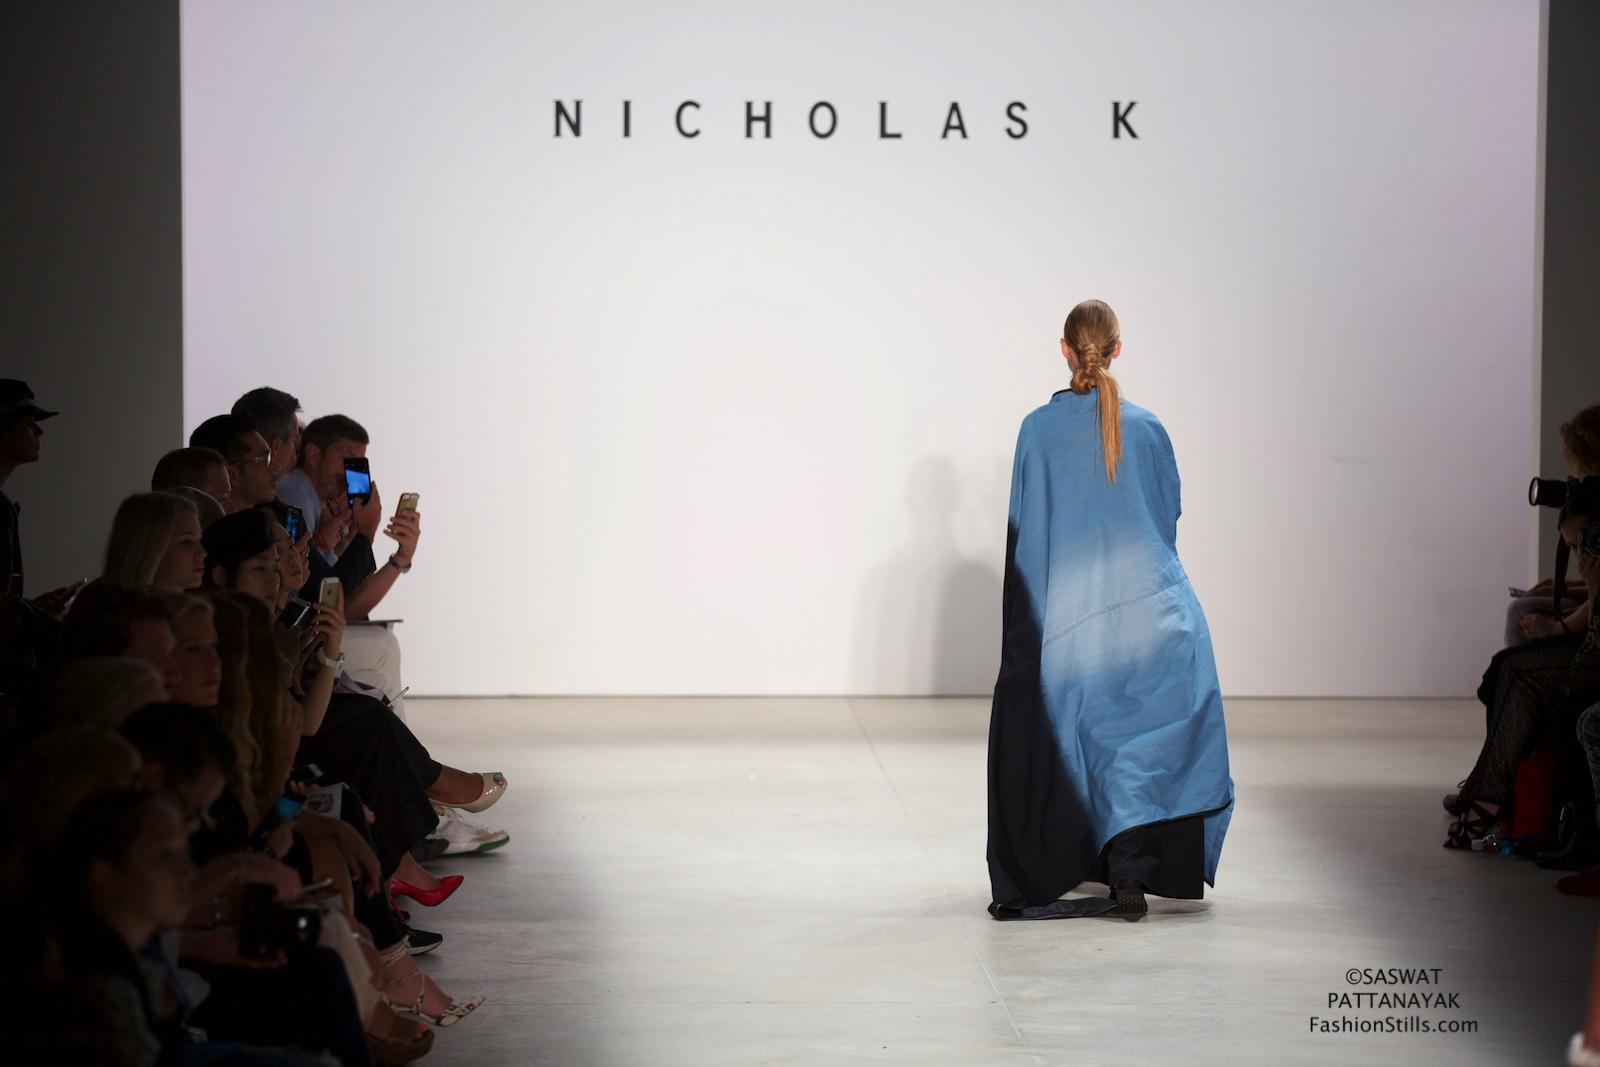 Nicholas-K-Saswat50.jpg